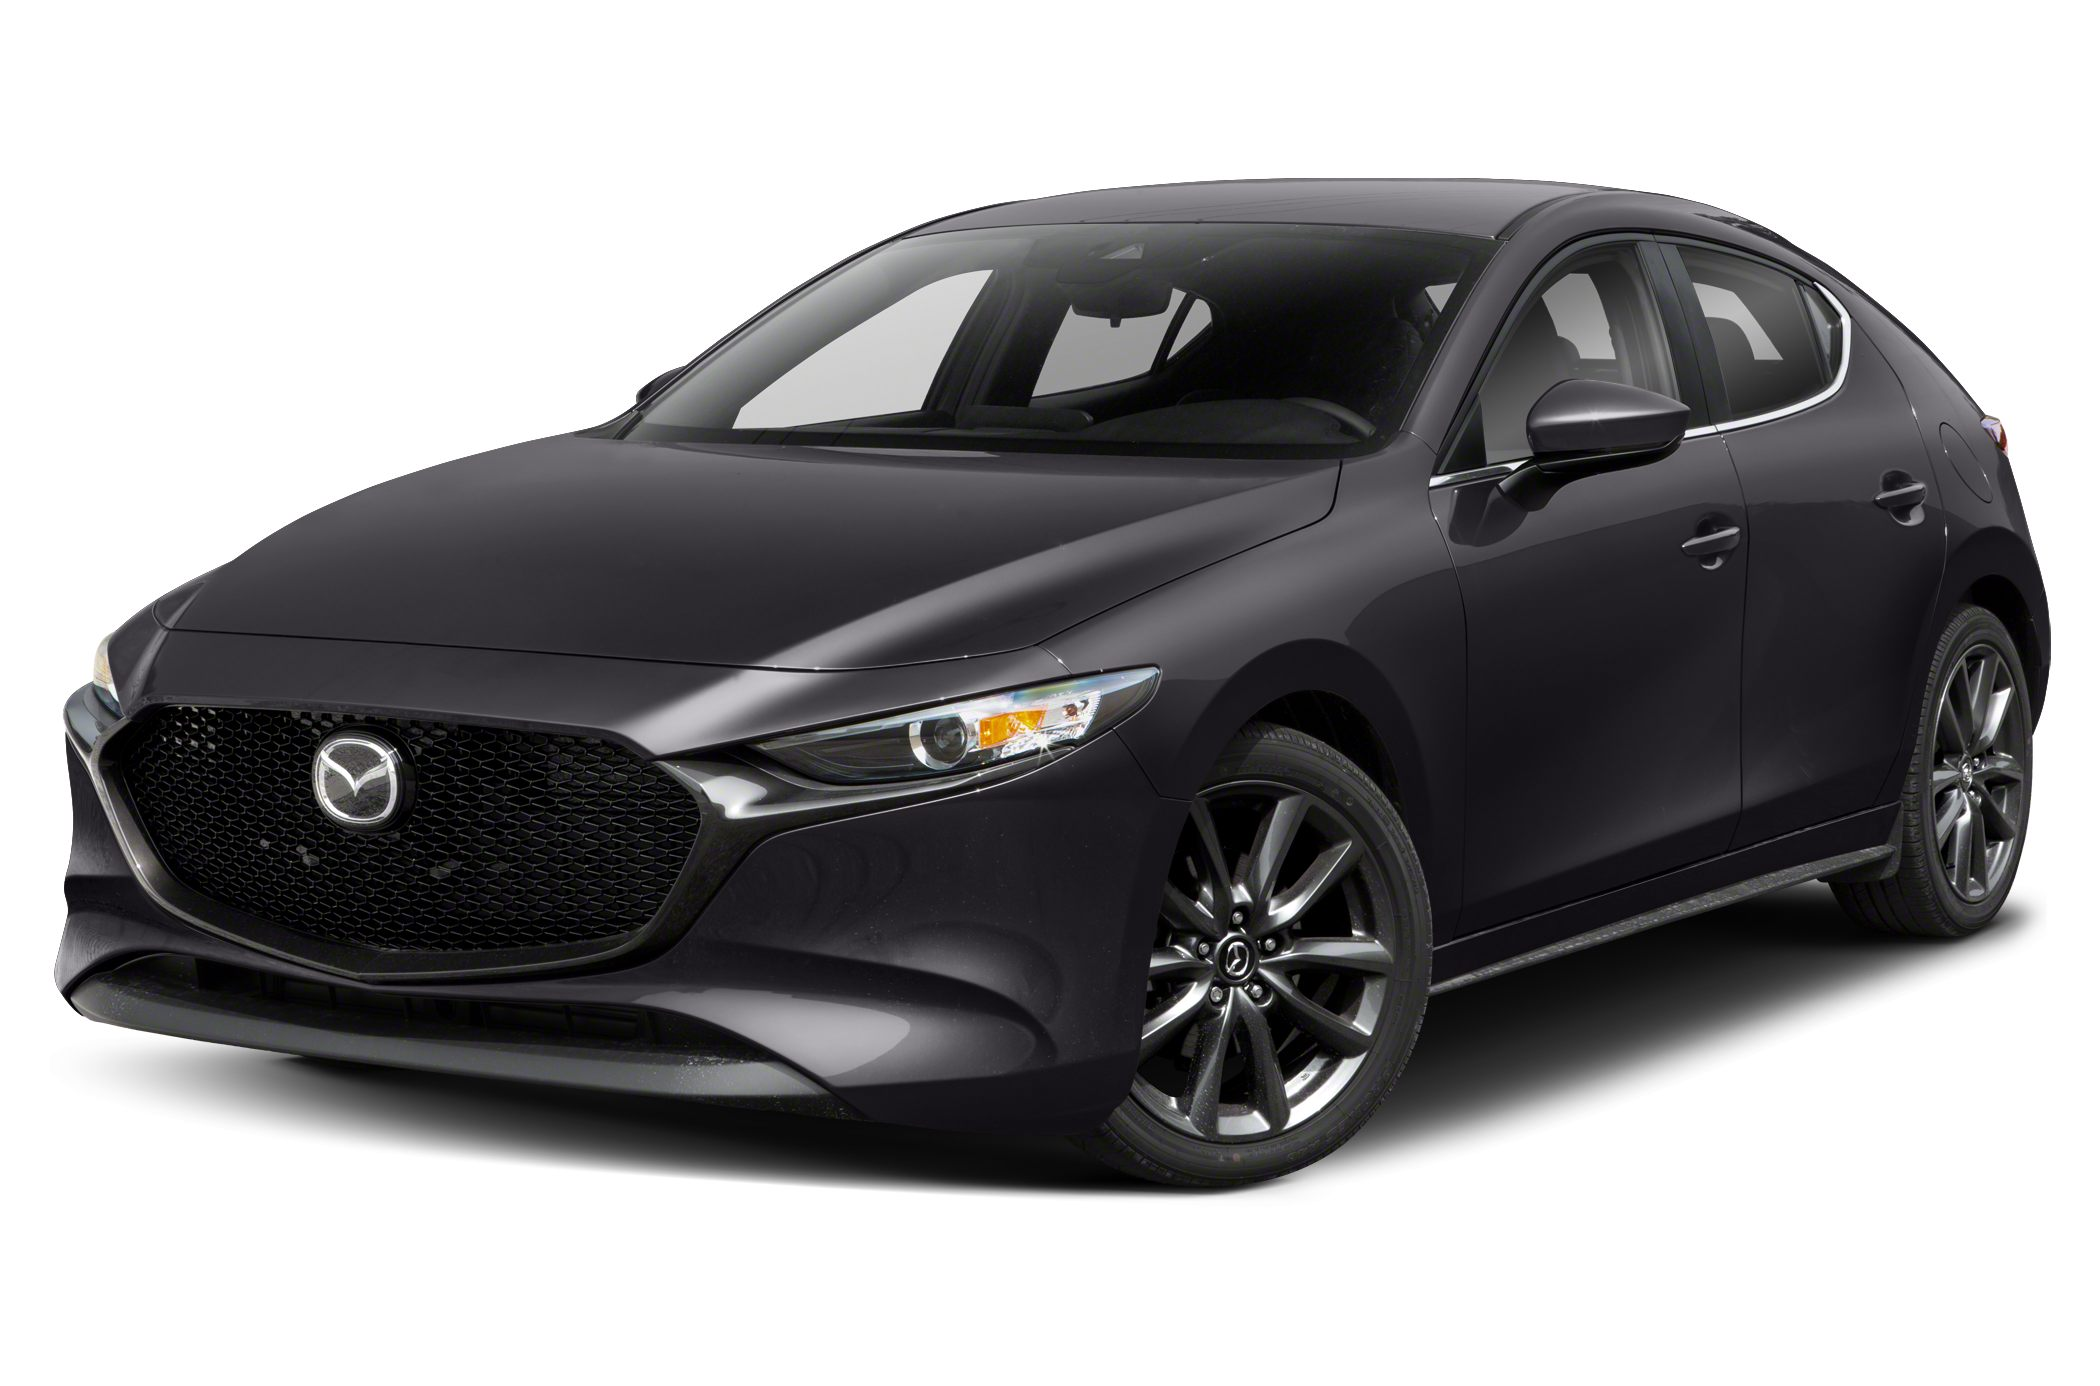 Base 4dr All Wheel Drive Hatchback 2019 Mazda Mazda3 Pricing